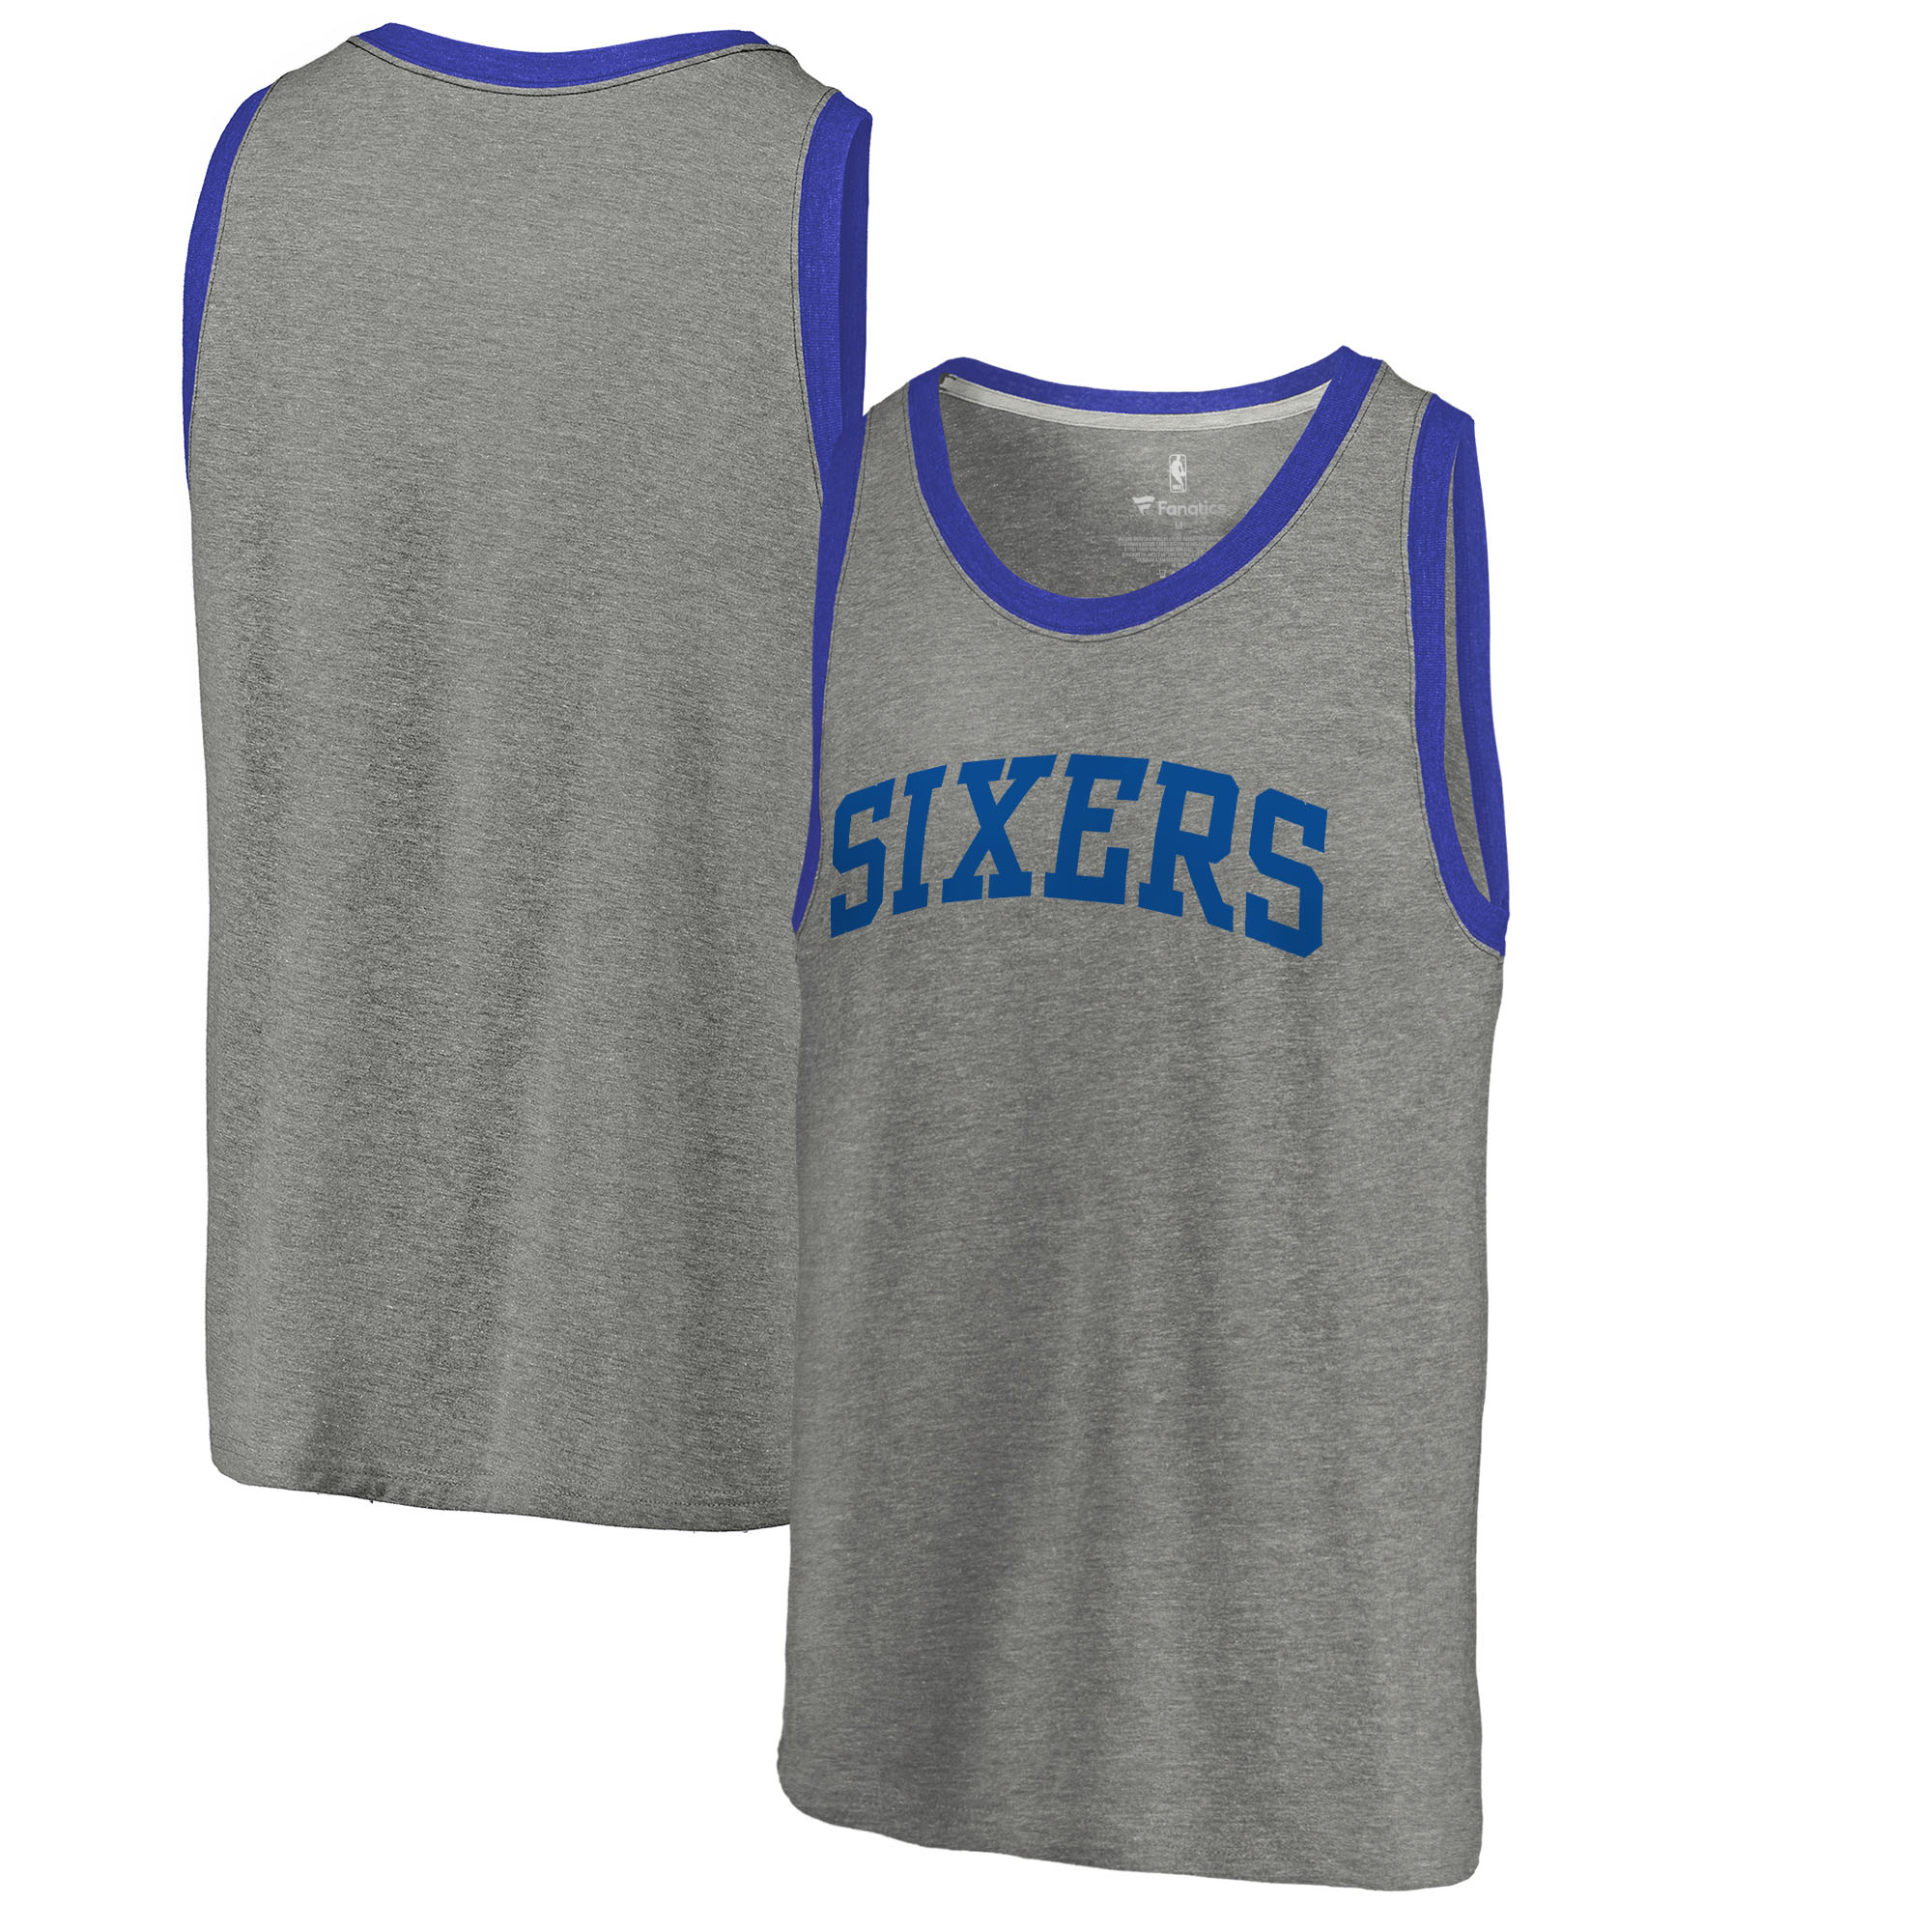 Philadelphia 76ers Fanatics Branded Wordmark Tri-Blend Tank Top - Heathered Gray